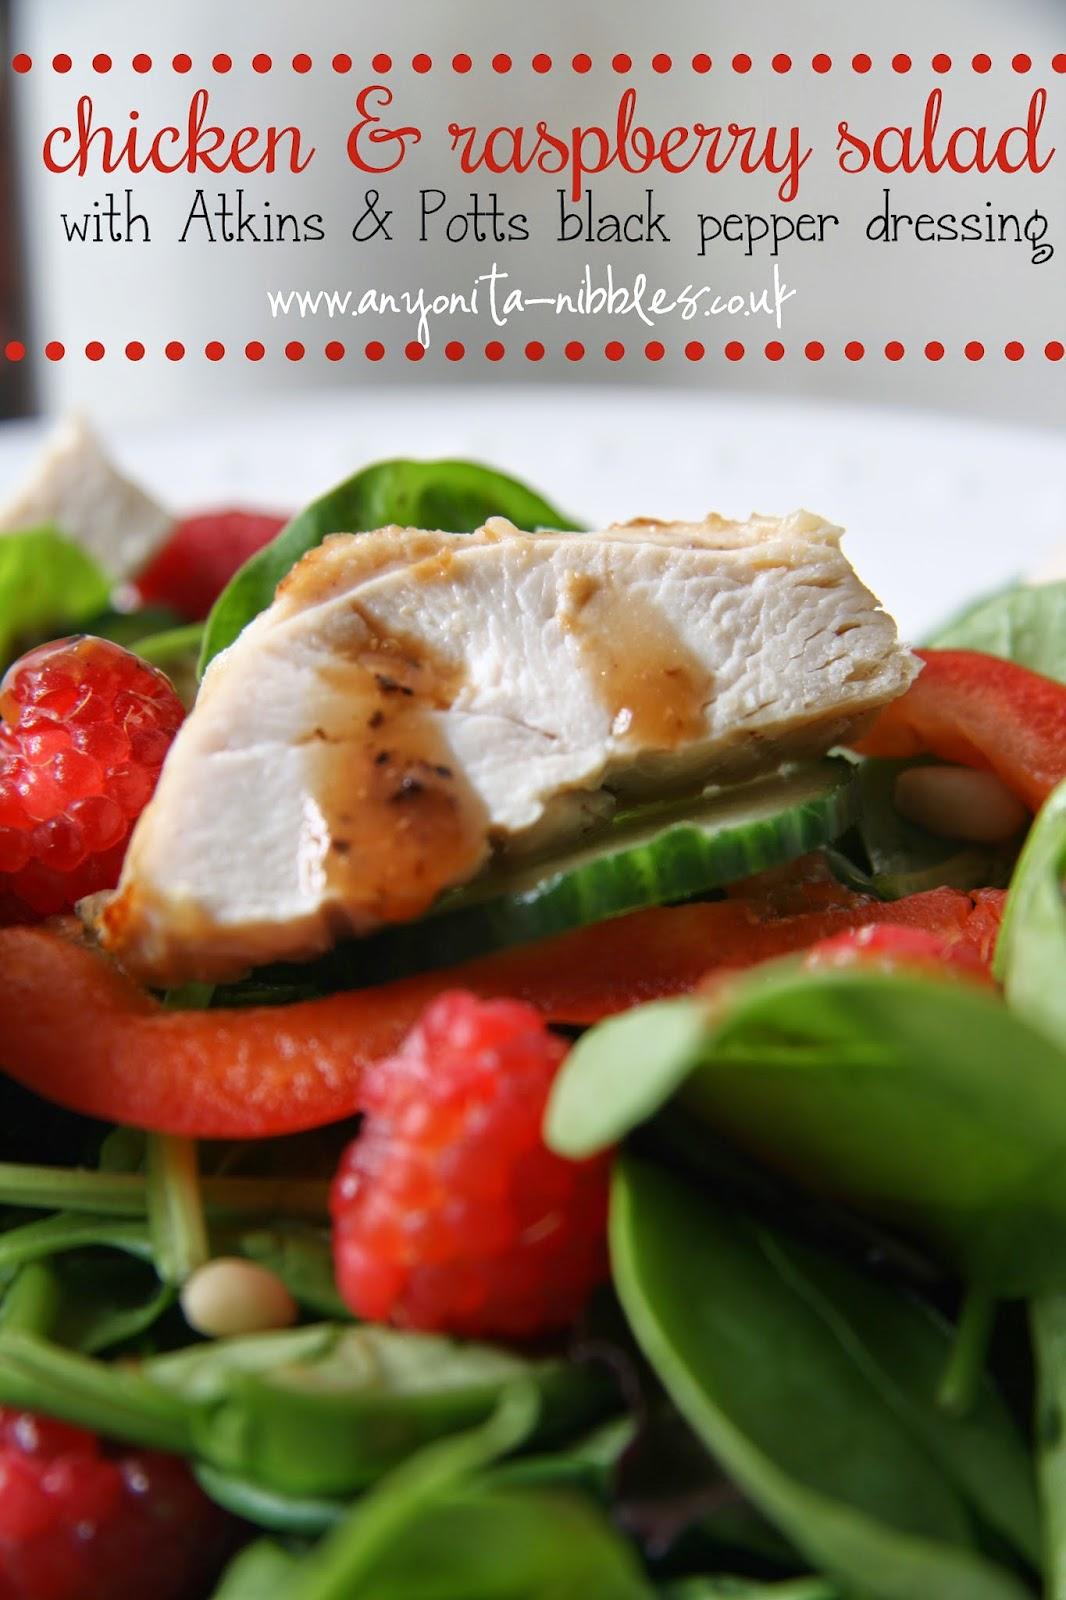 Chicken & Raspberry Salad with Atkins & Potts Raspberry & Black Pepper Dressing #glutenfree #healthy #salads